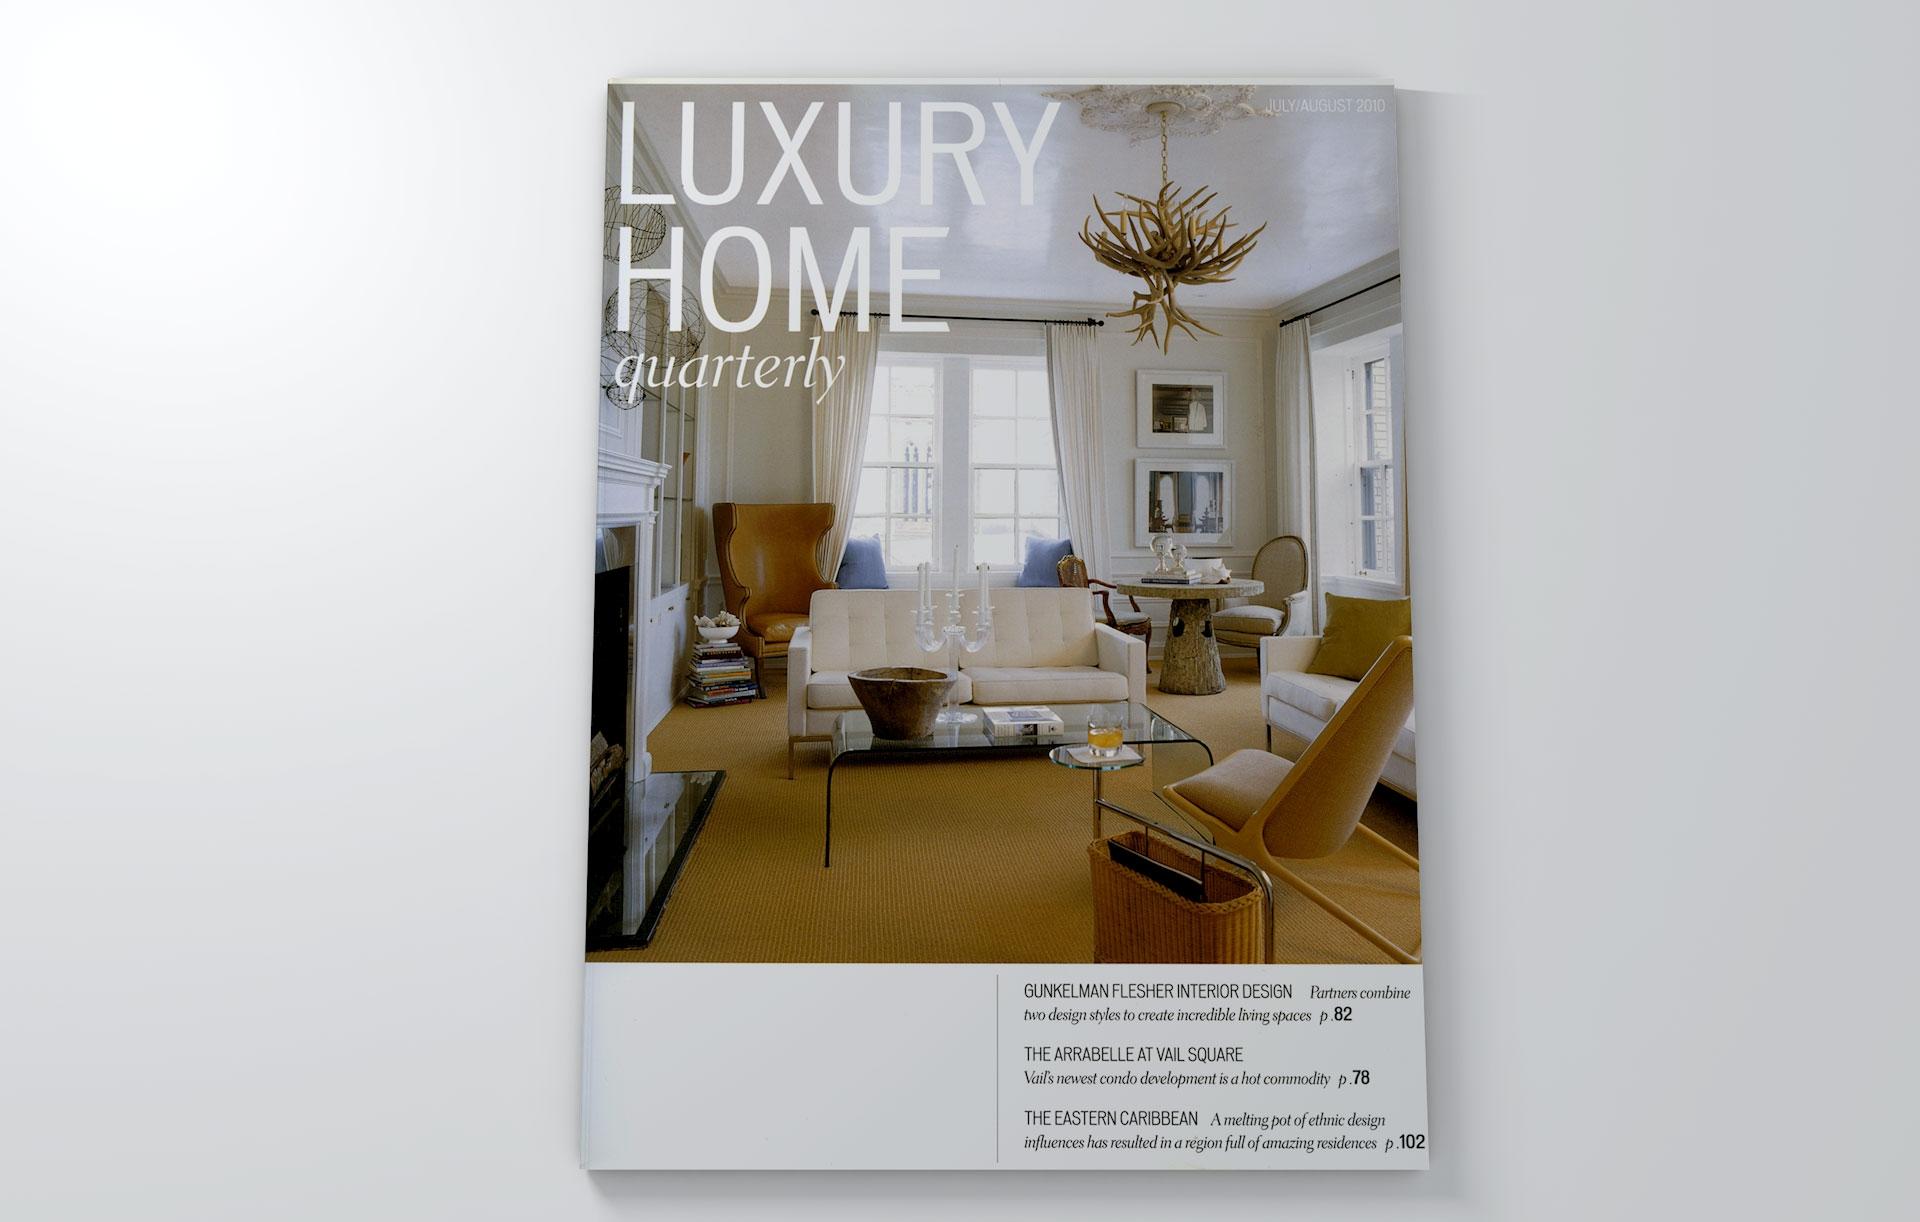 luxury home quarterly july august 2010 u s lab